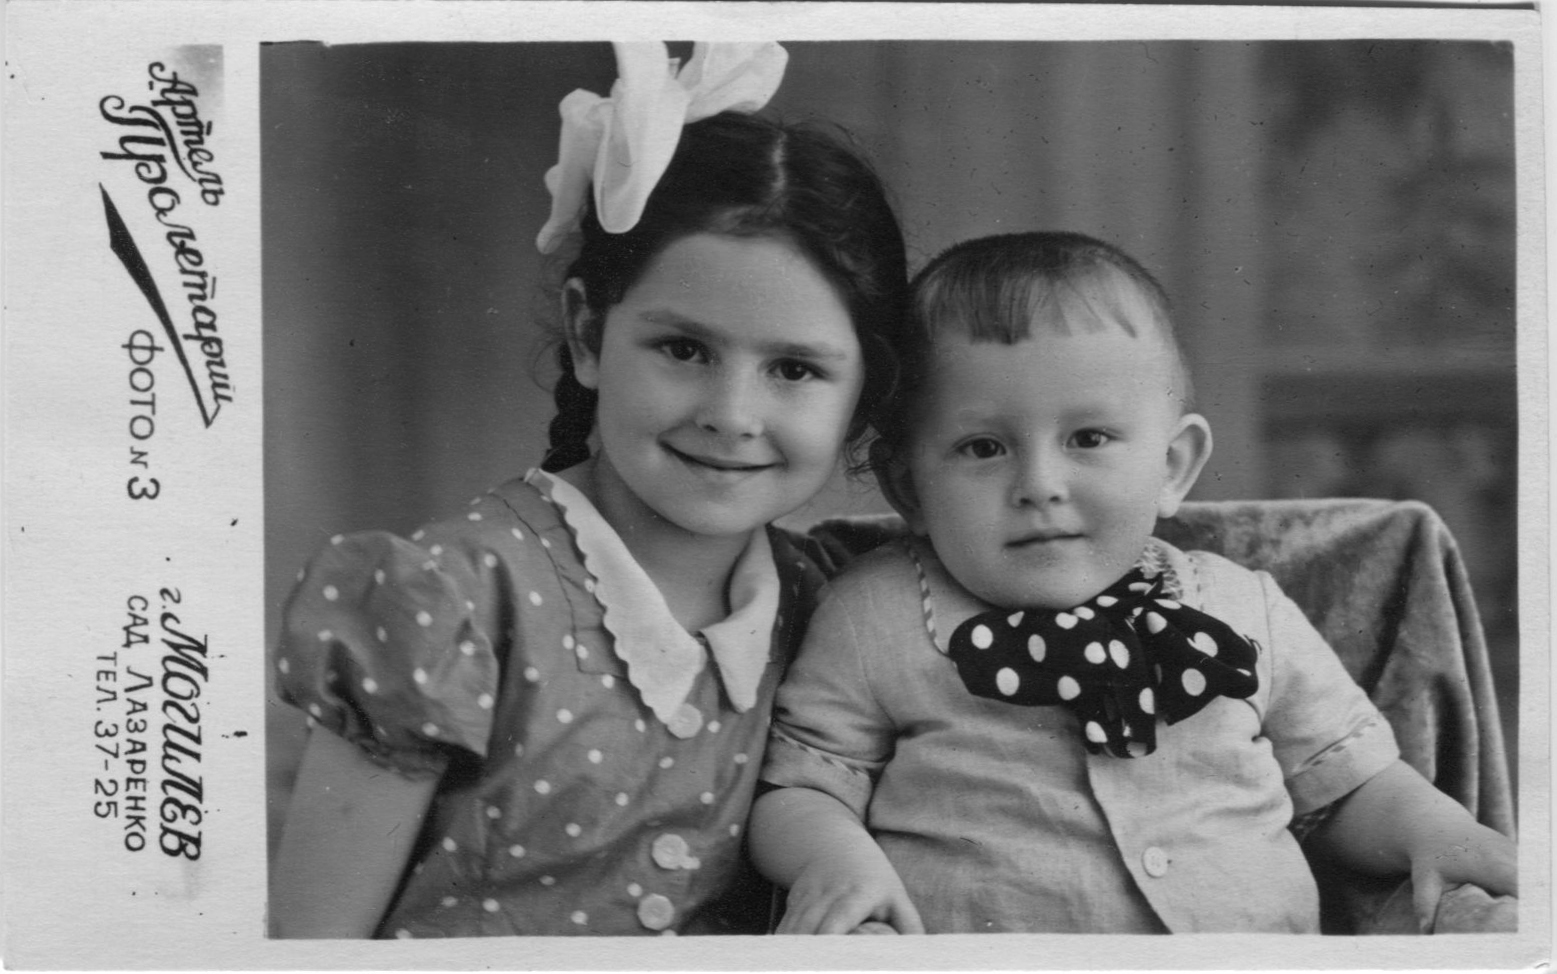 Berta's children Sofa and Igor001